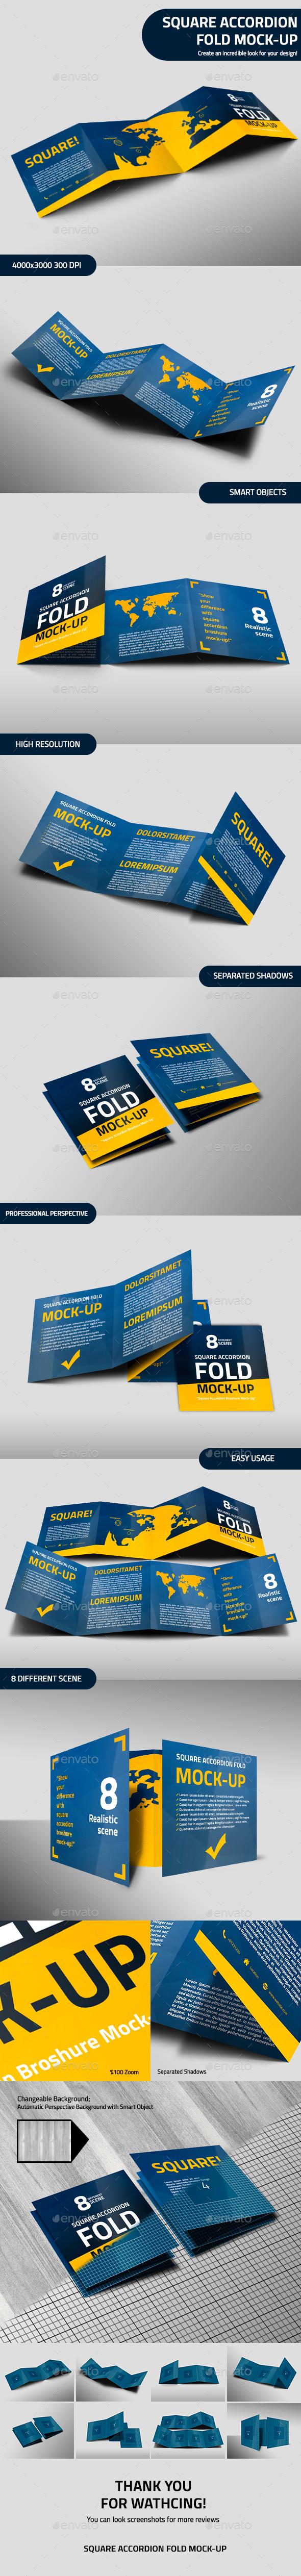 Square Accordion Fold Brochure Mock-Up - Brochures Print